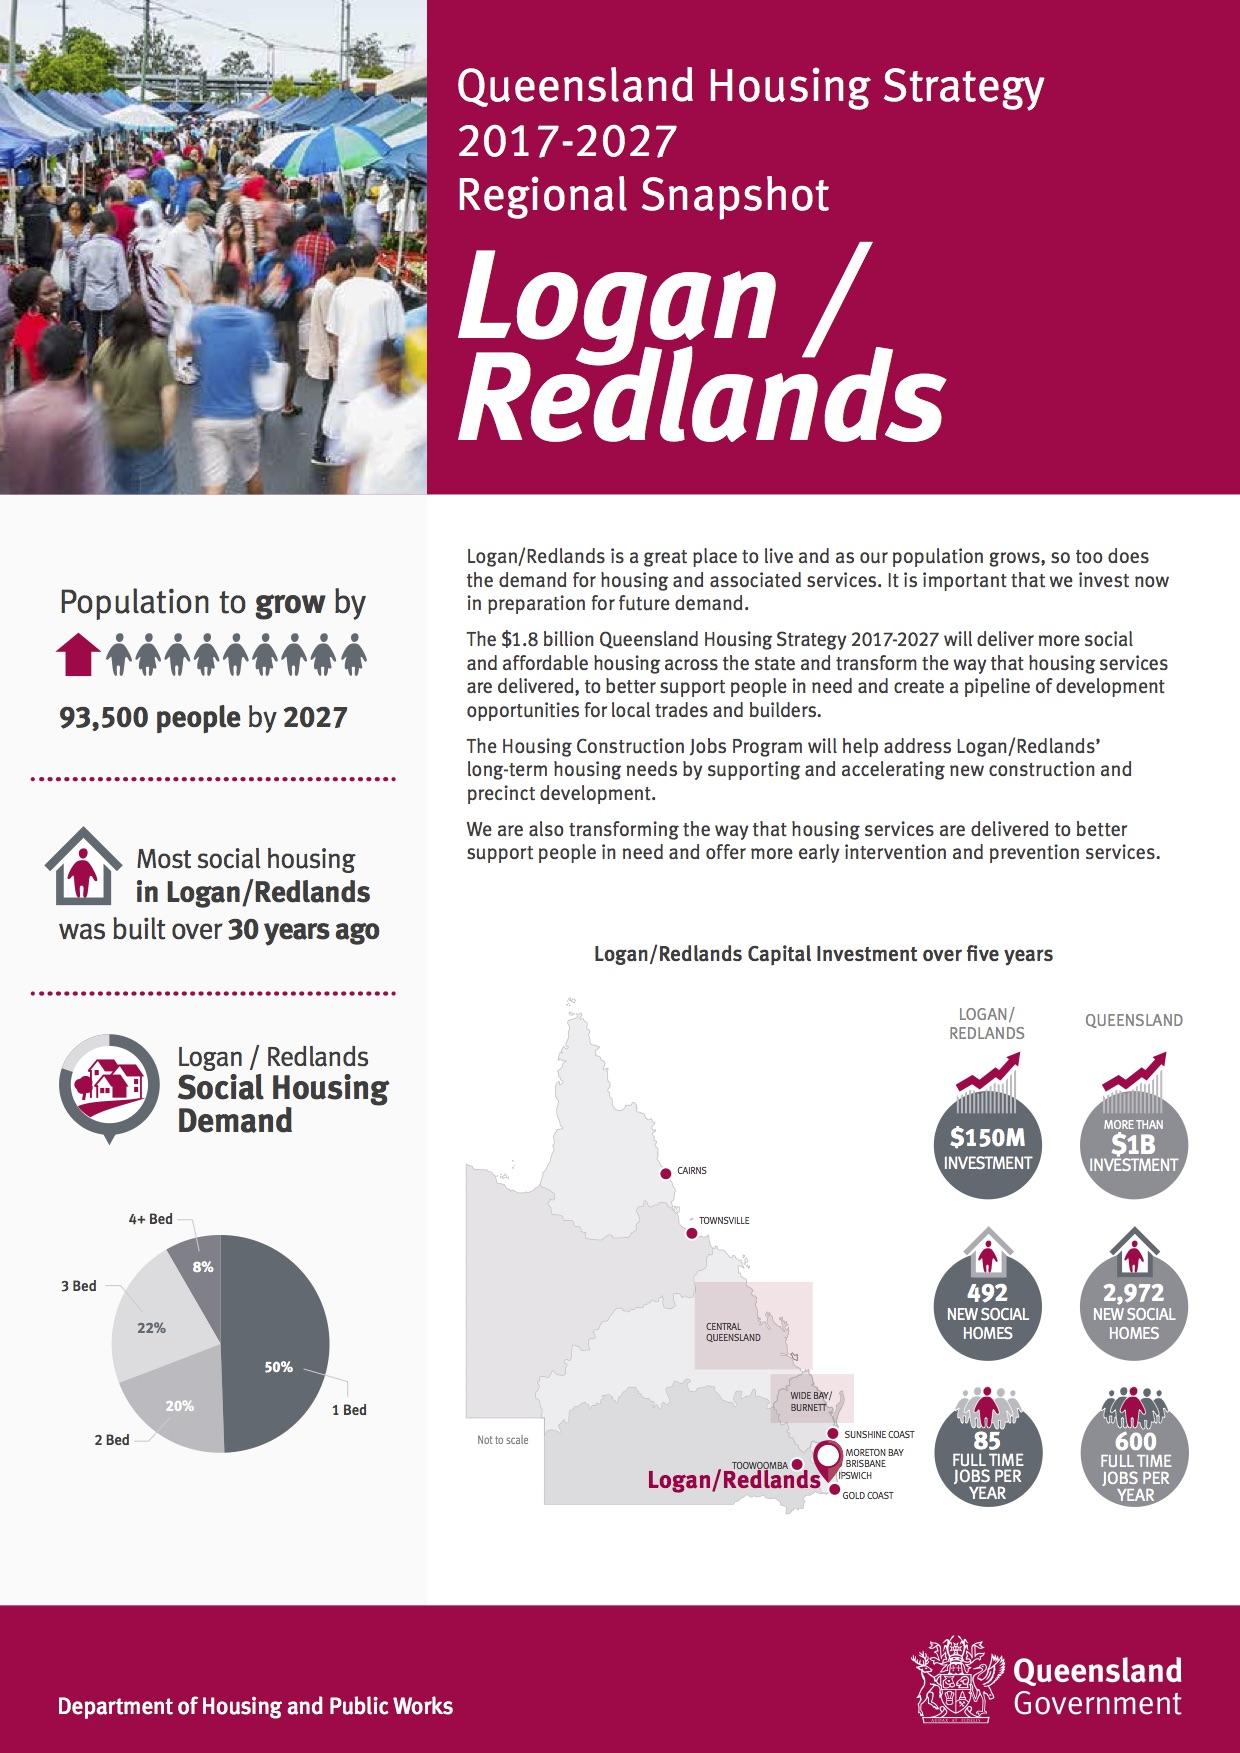 FactSheetLoganRedlands.jpg